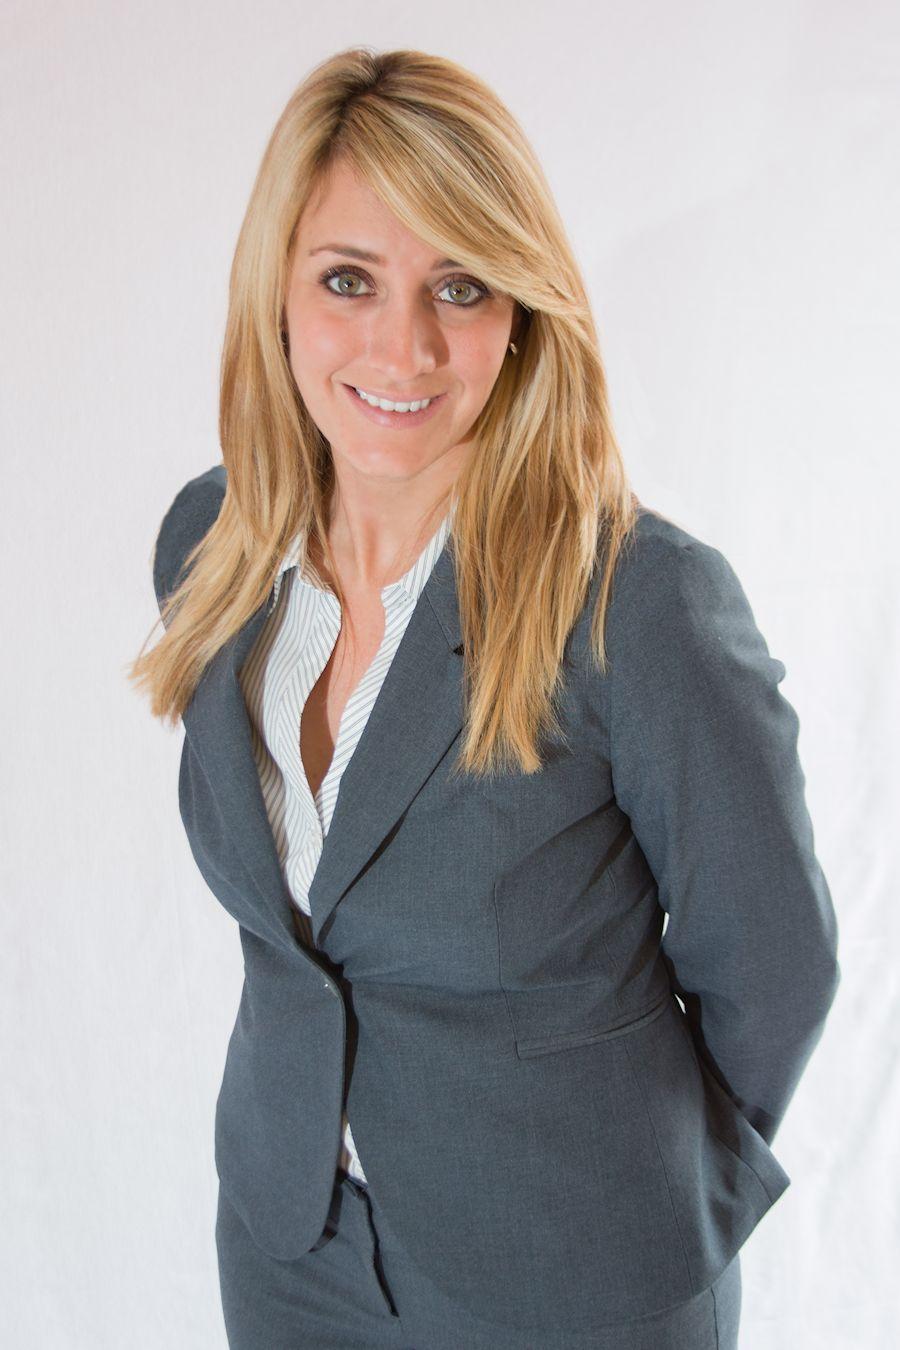 Alexandra Gleim